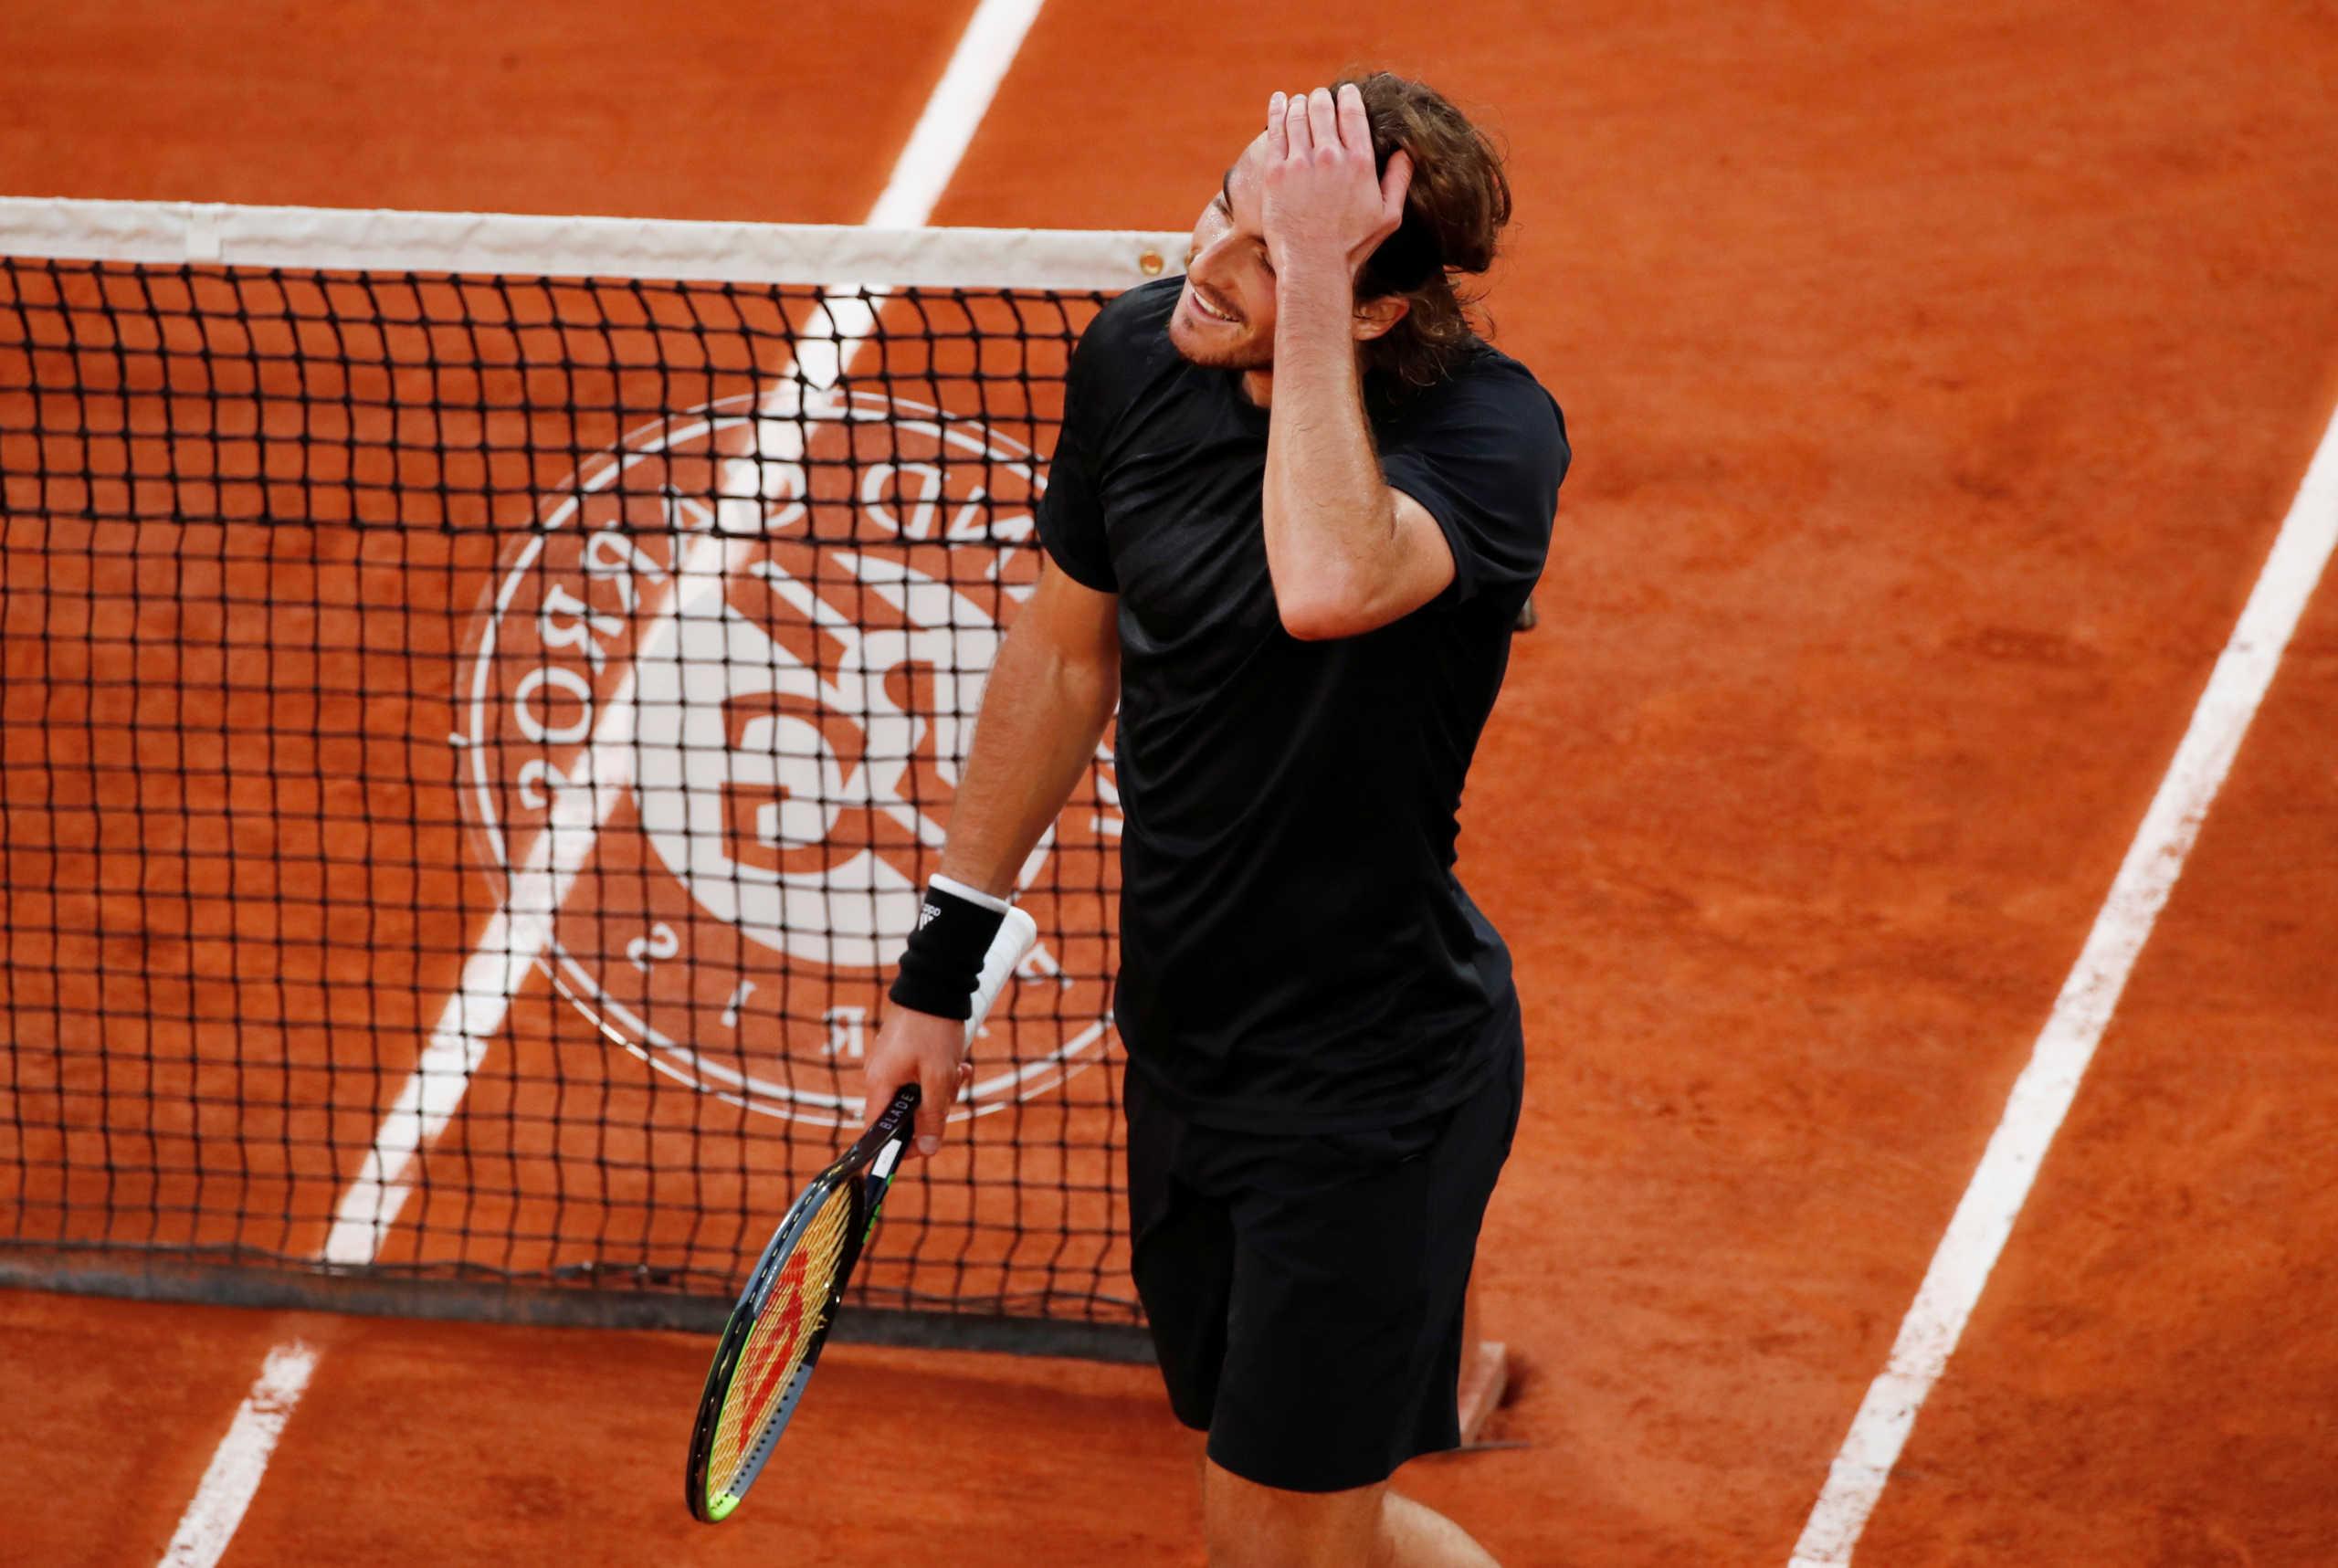 Roland Garros: Άλλαξε ημερομηνία το φημισμένο τουρνουά του Παρισιού (pic)